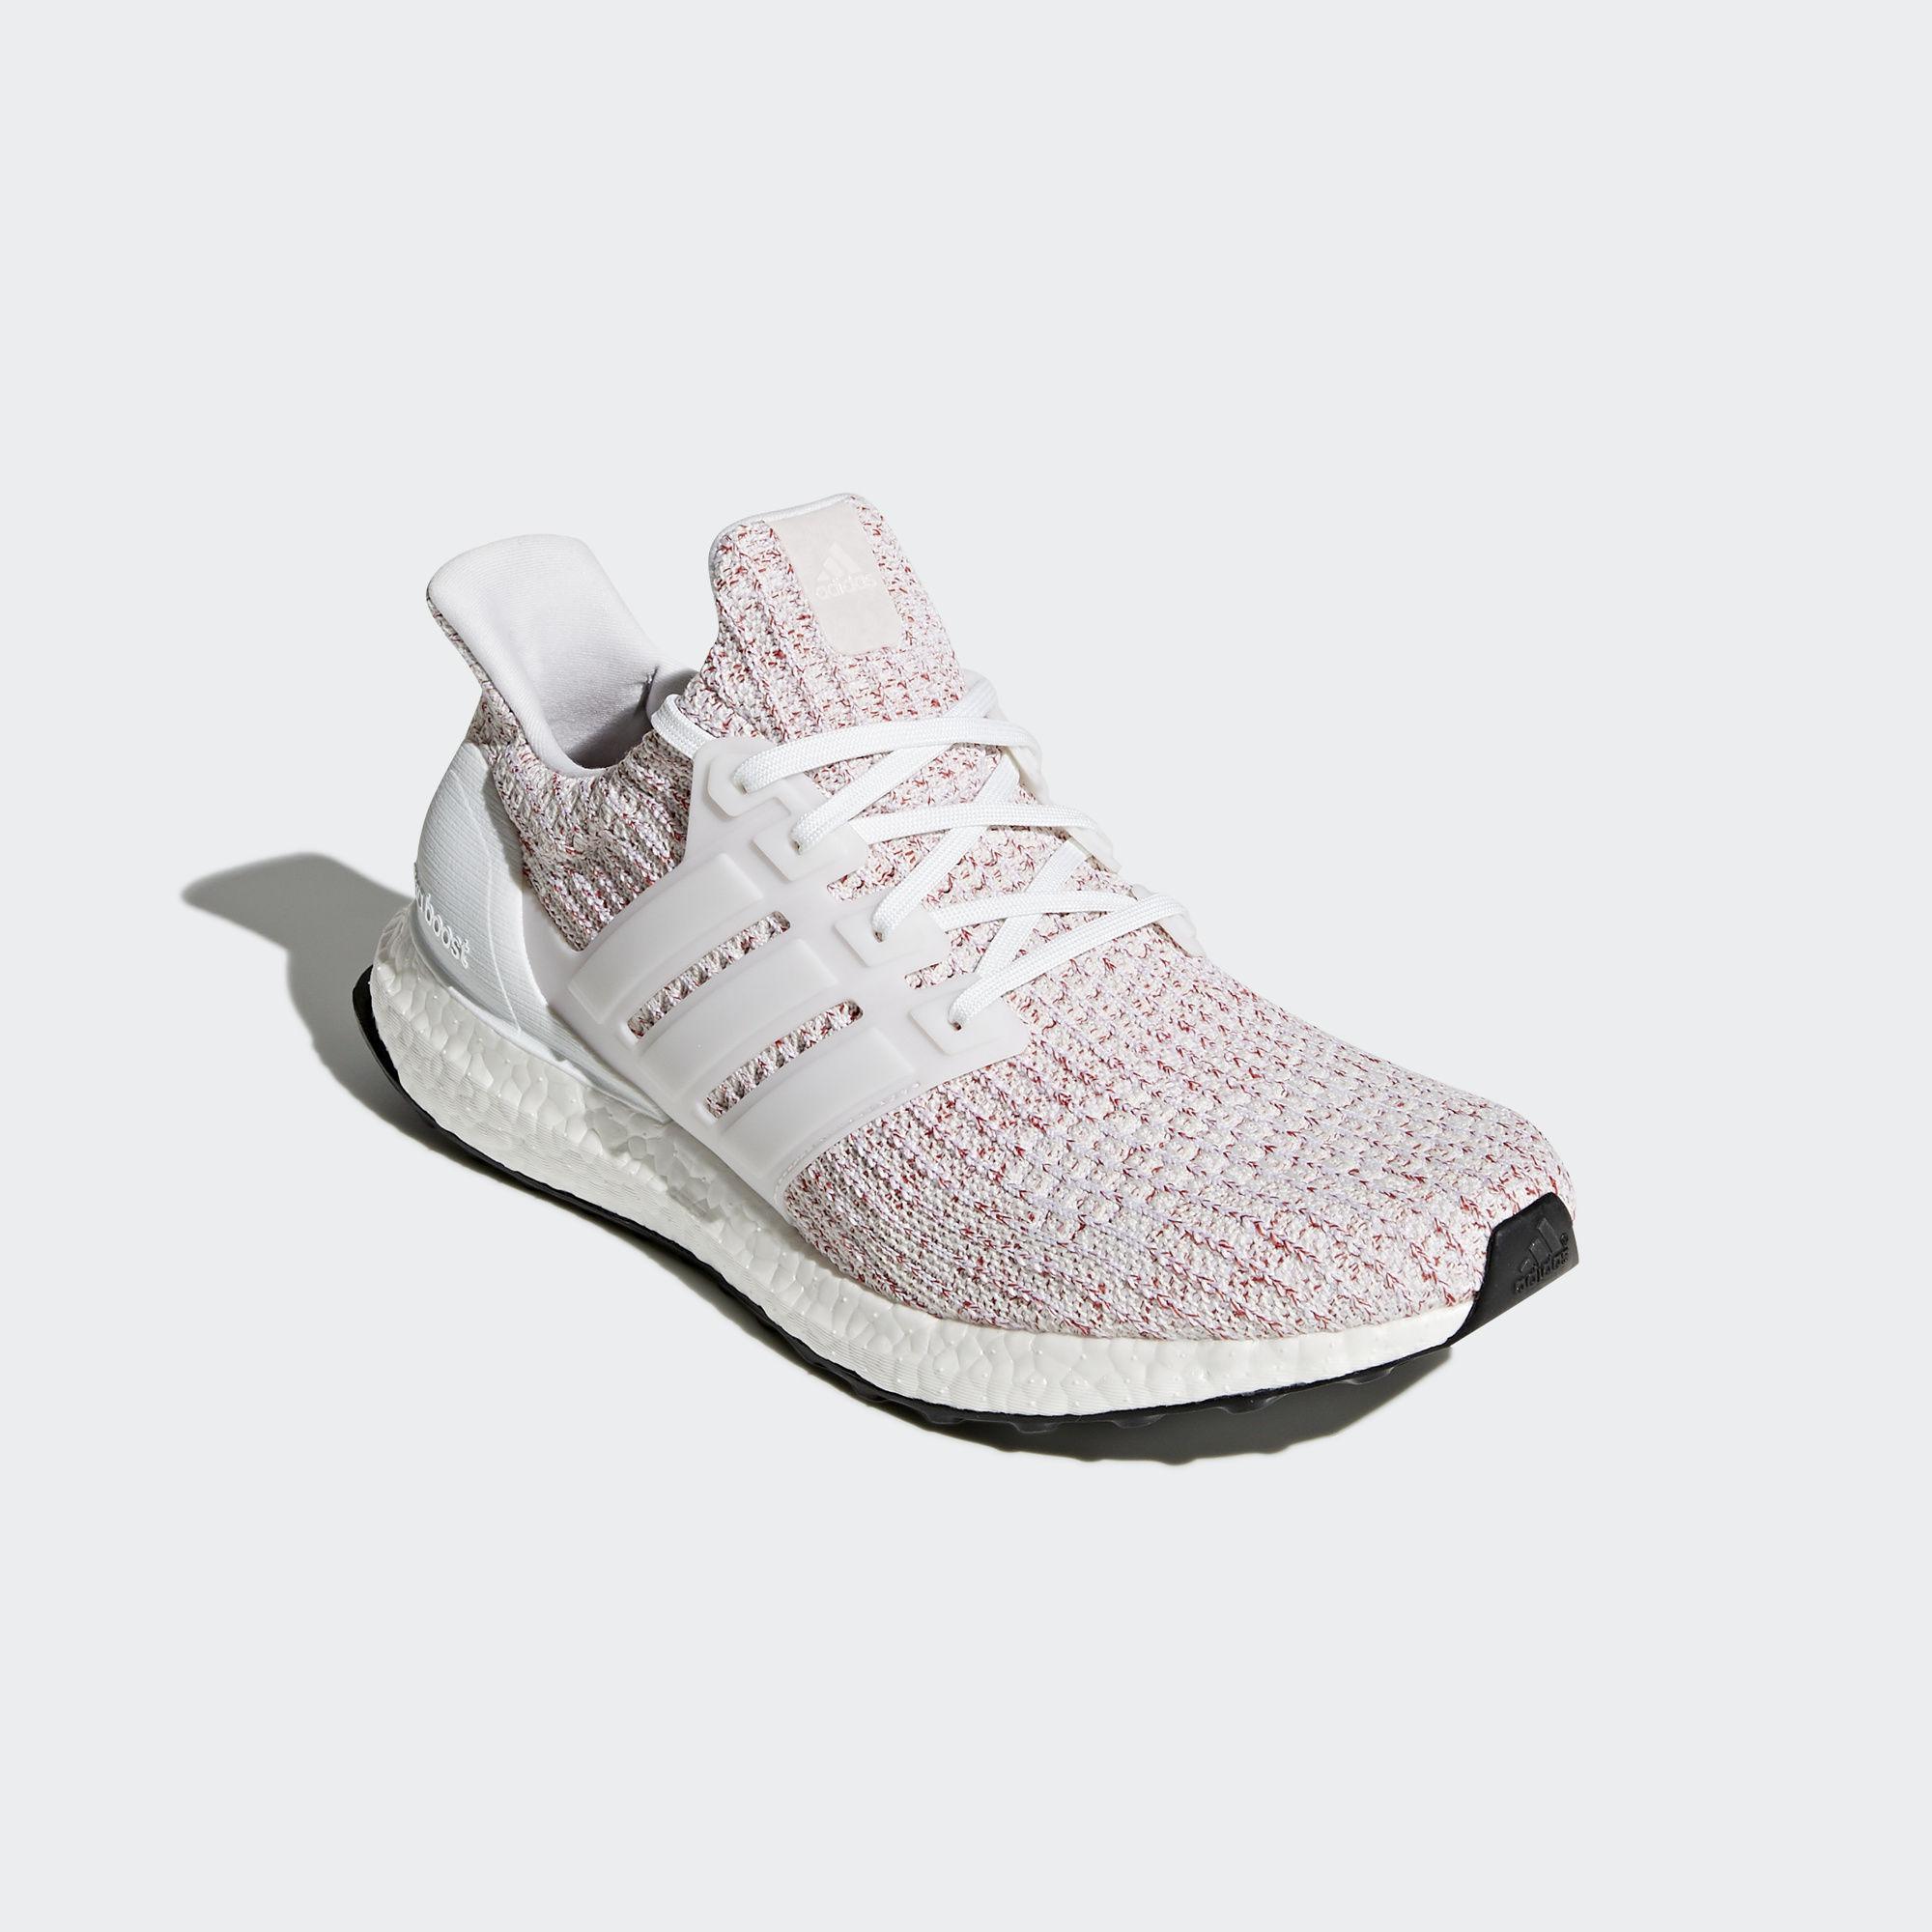 835e143ec Adidas Mens Ultra Boost Running Shoes - White Scarlet - Tennisnuts.com